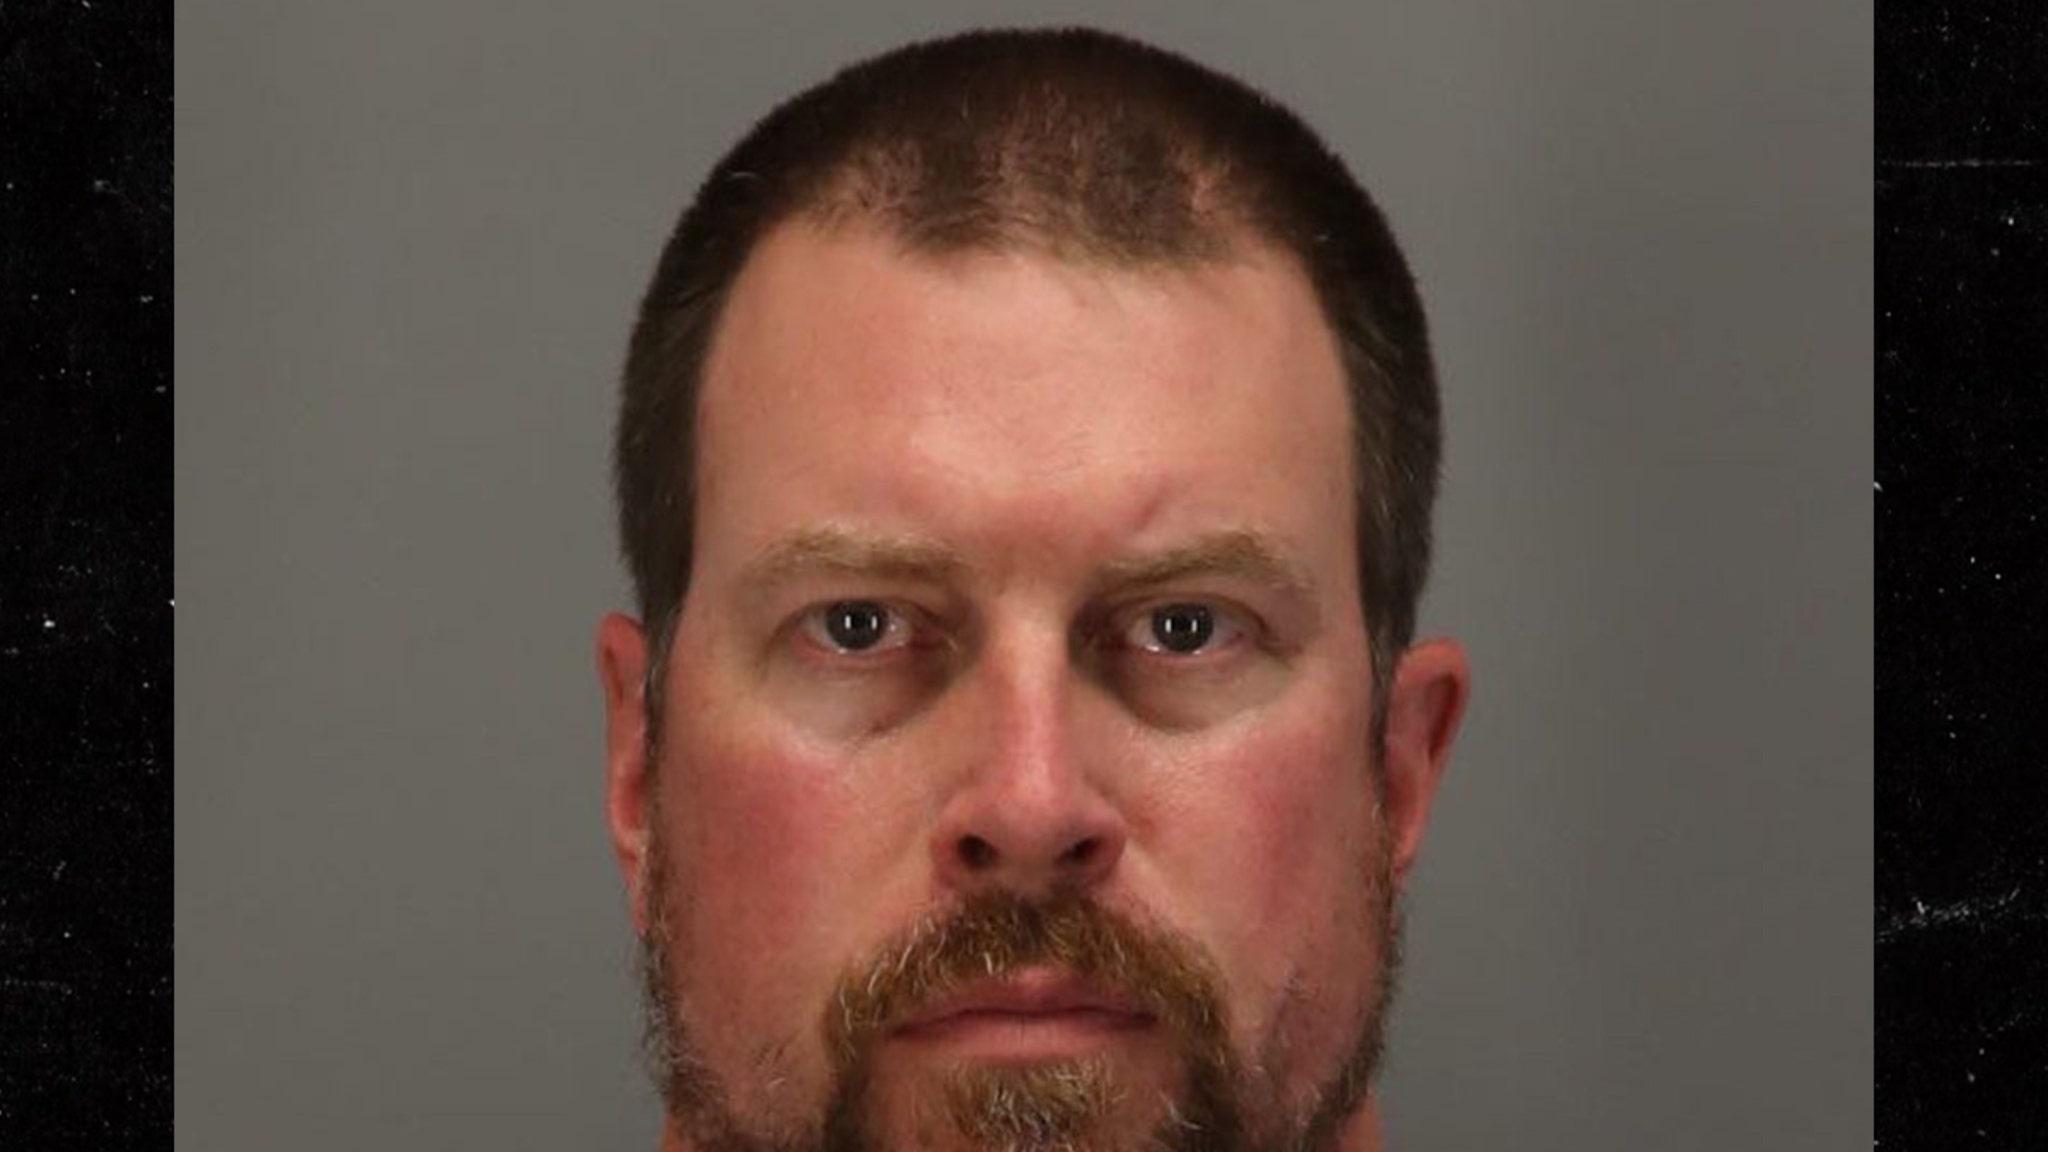 Ryan Leaf Arrested for Domestic Battery in Palm Springs, Mug Shot Released